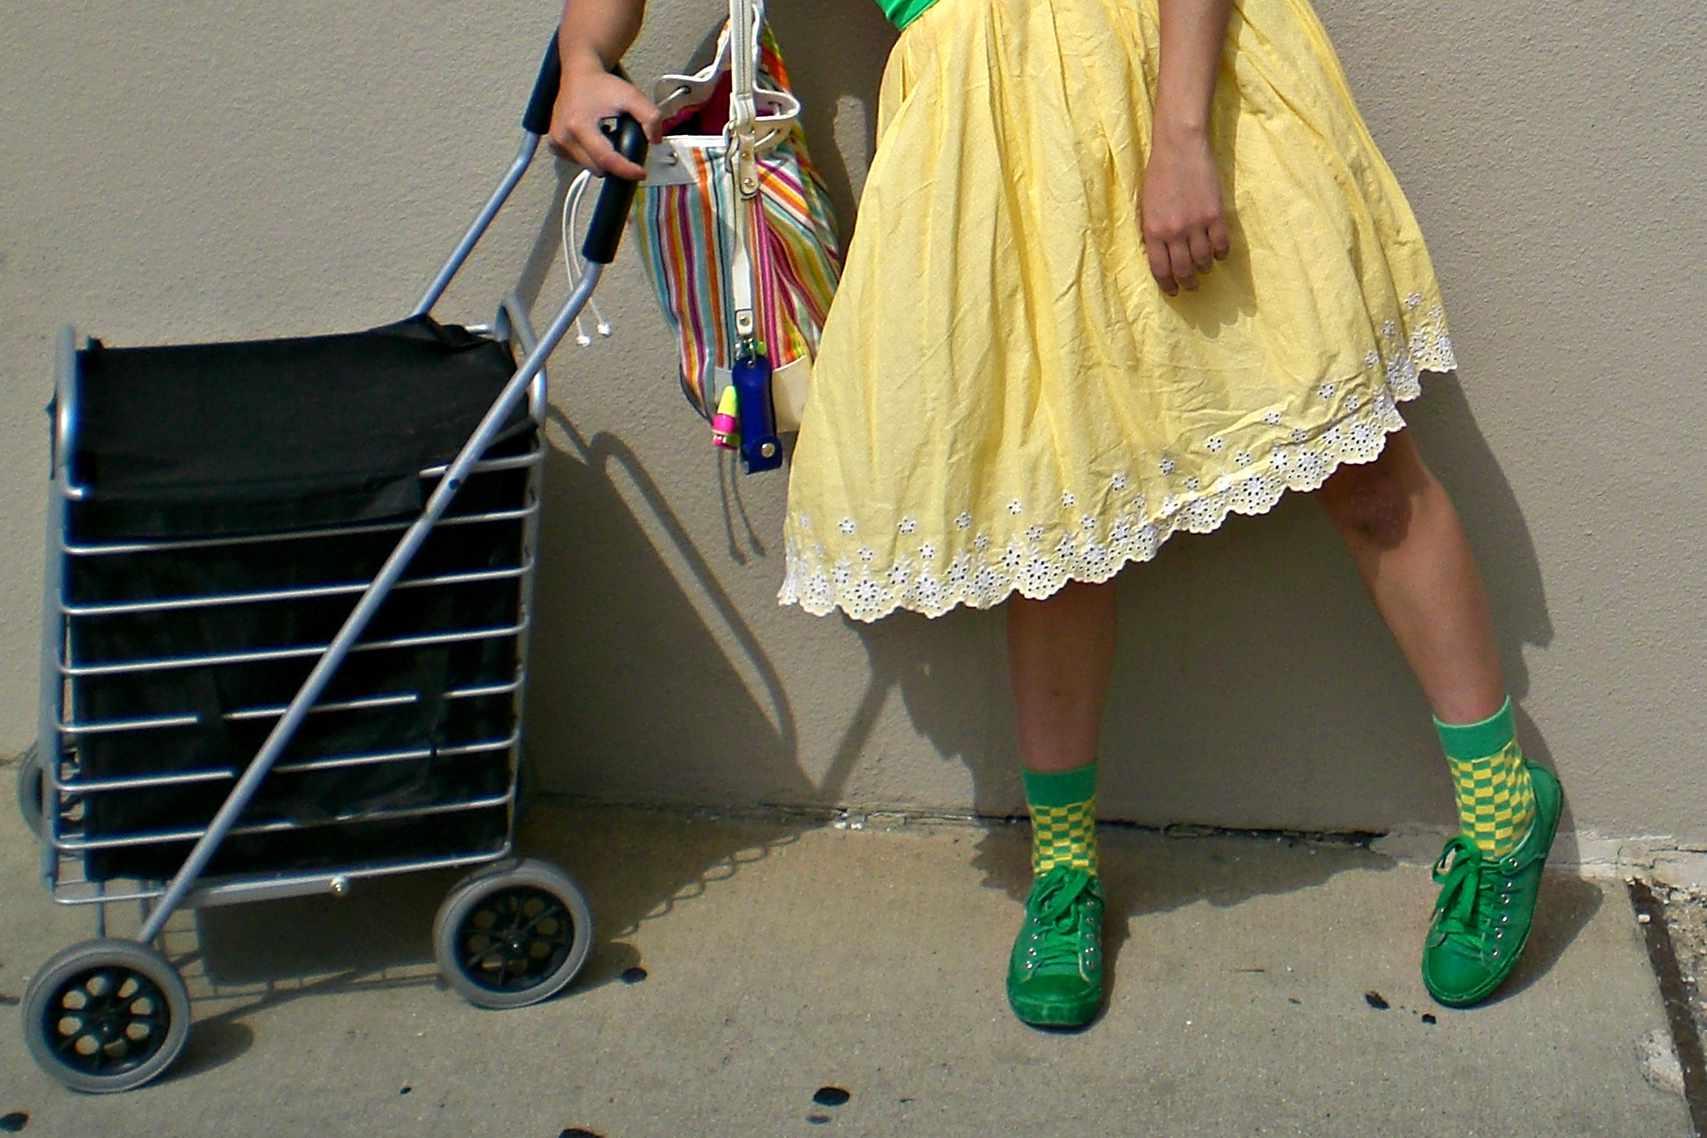 flea market shopper with a folding cart